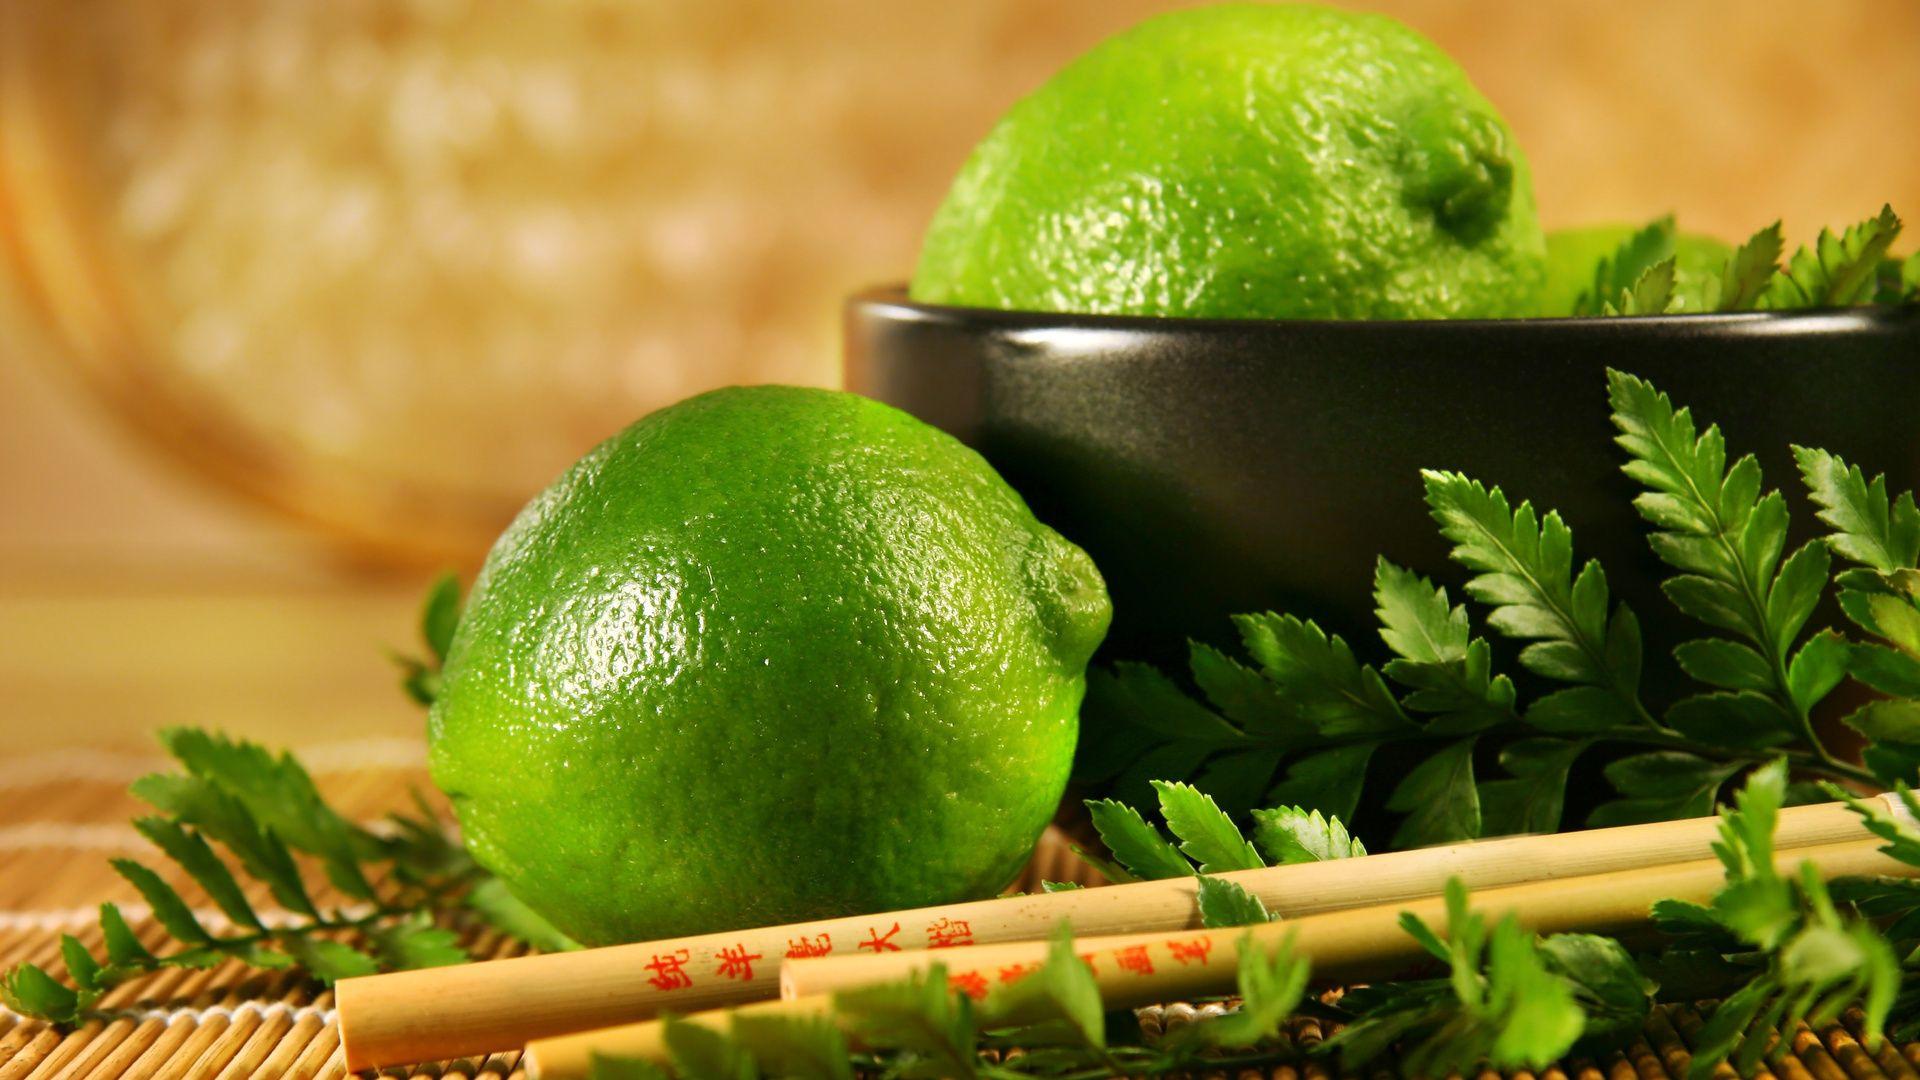 Lime desktop wallpaper